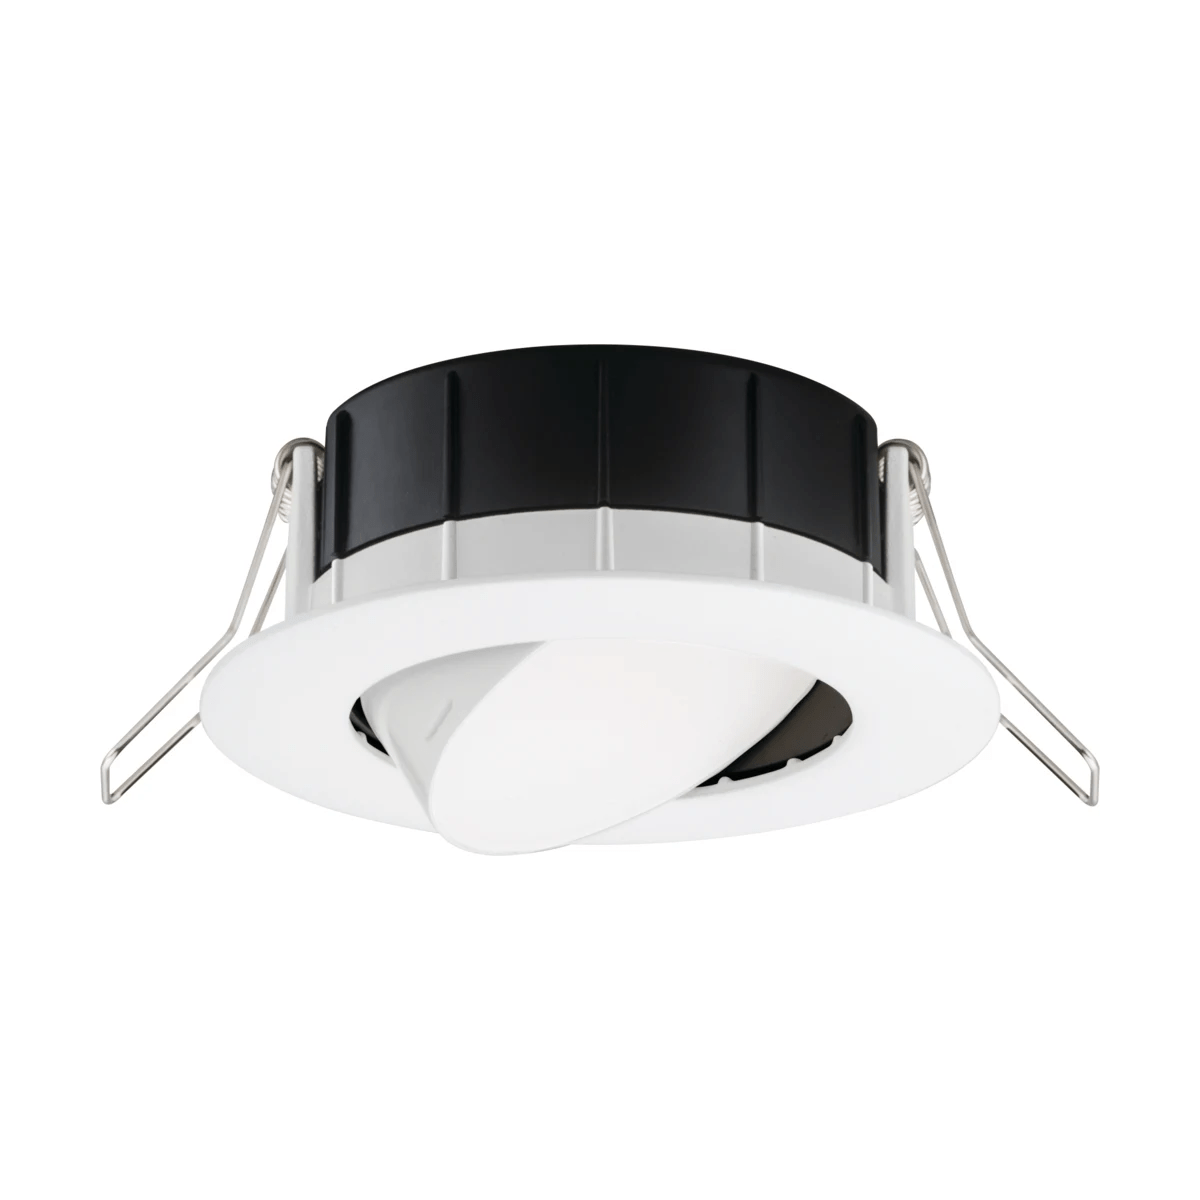 lithonia lighting wf3 adj led 90cri m6